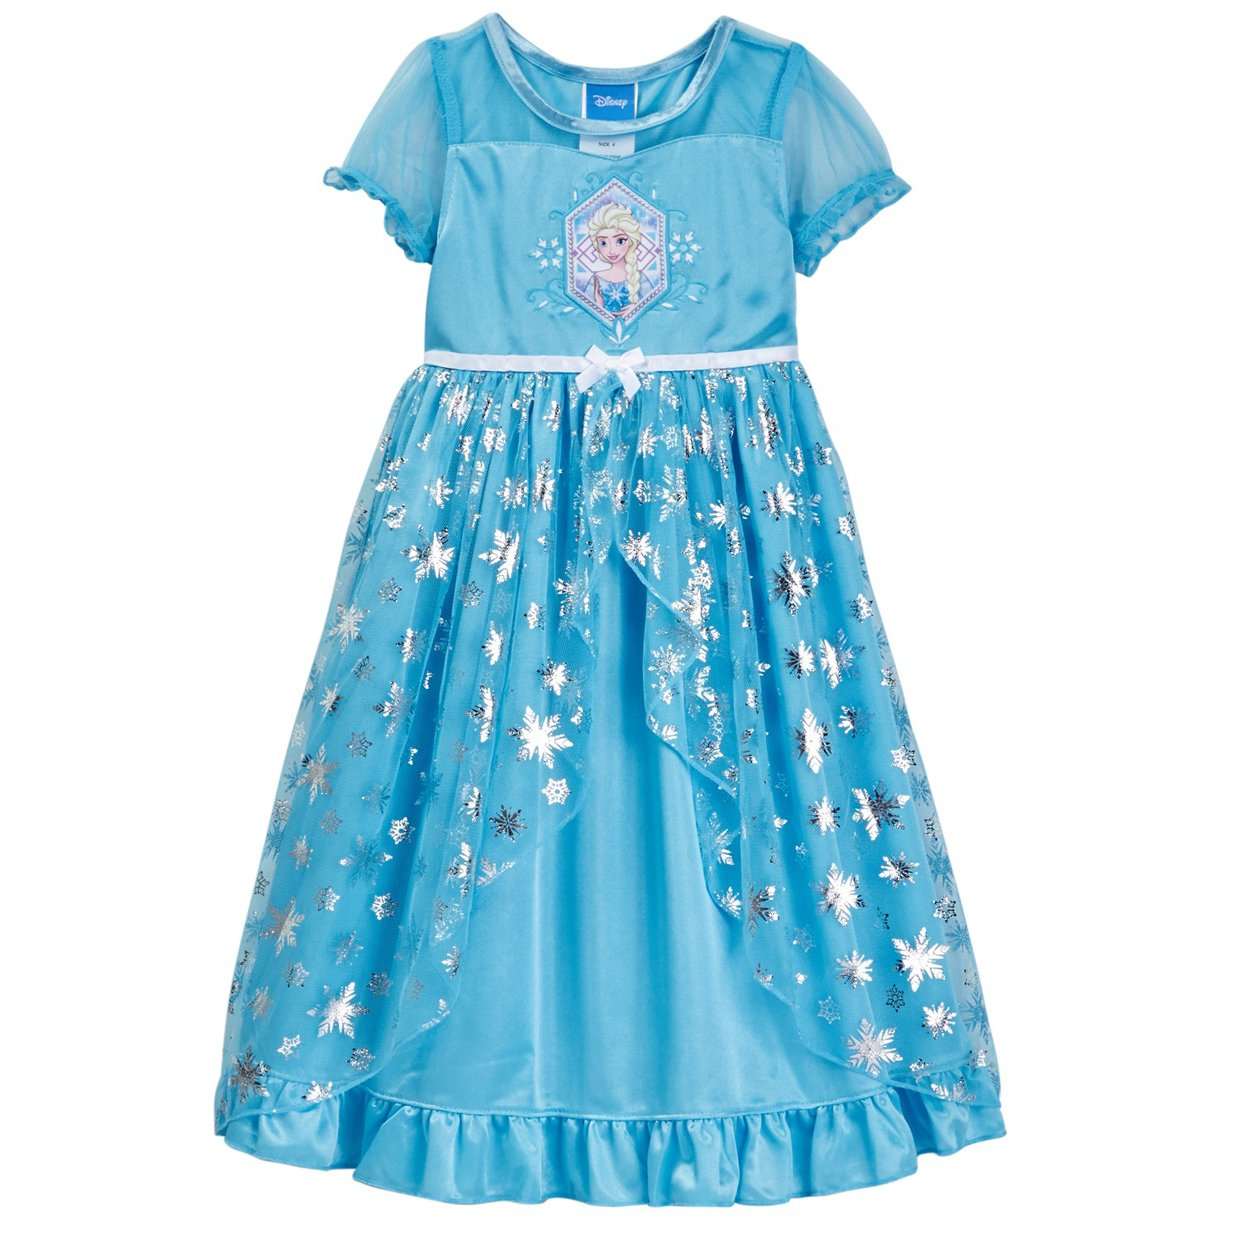 Disney Big Girls\' Frozen Elsa Fantasy Nightgown, Blue, 10 ...